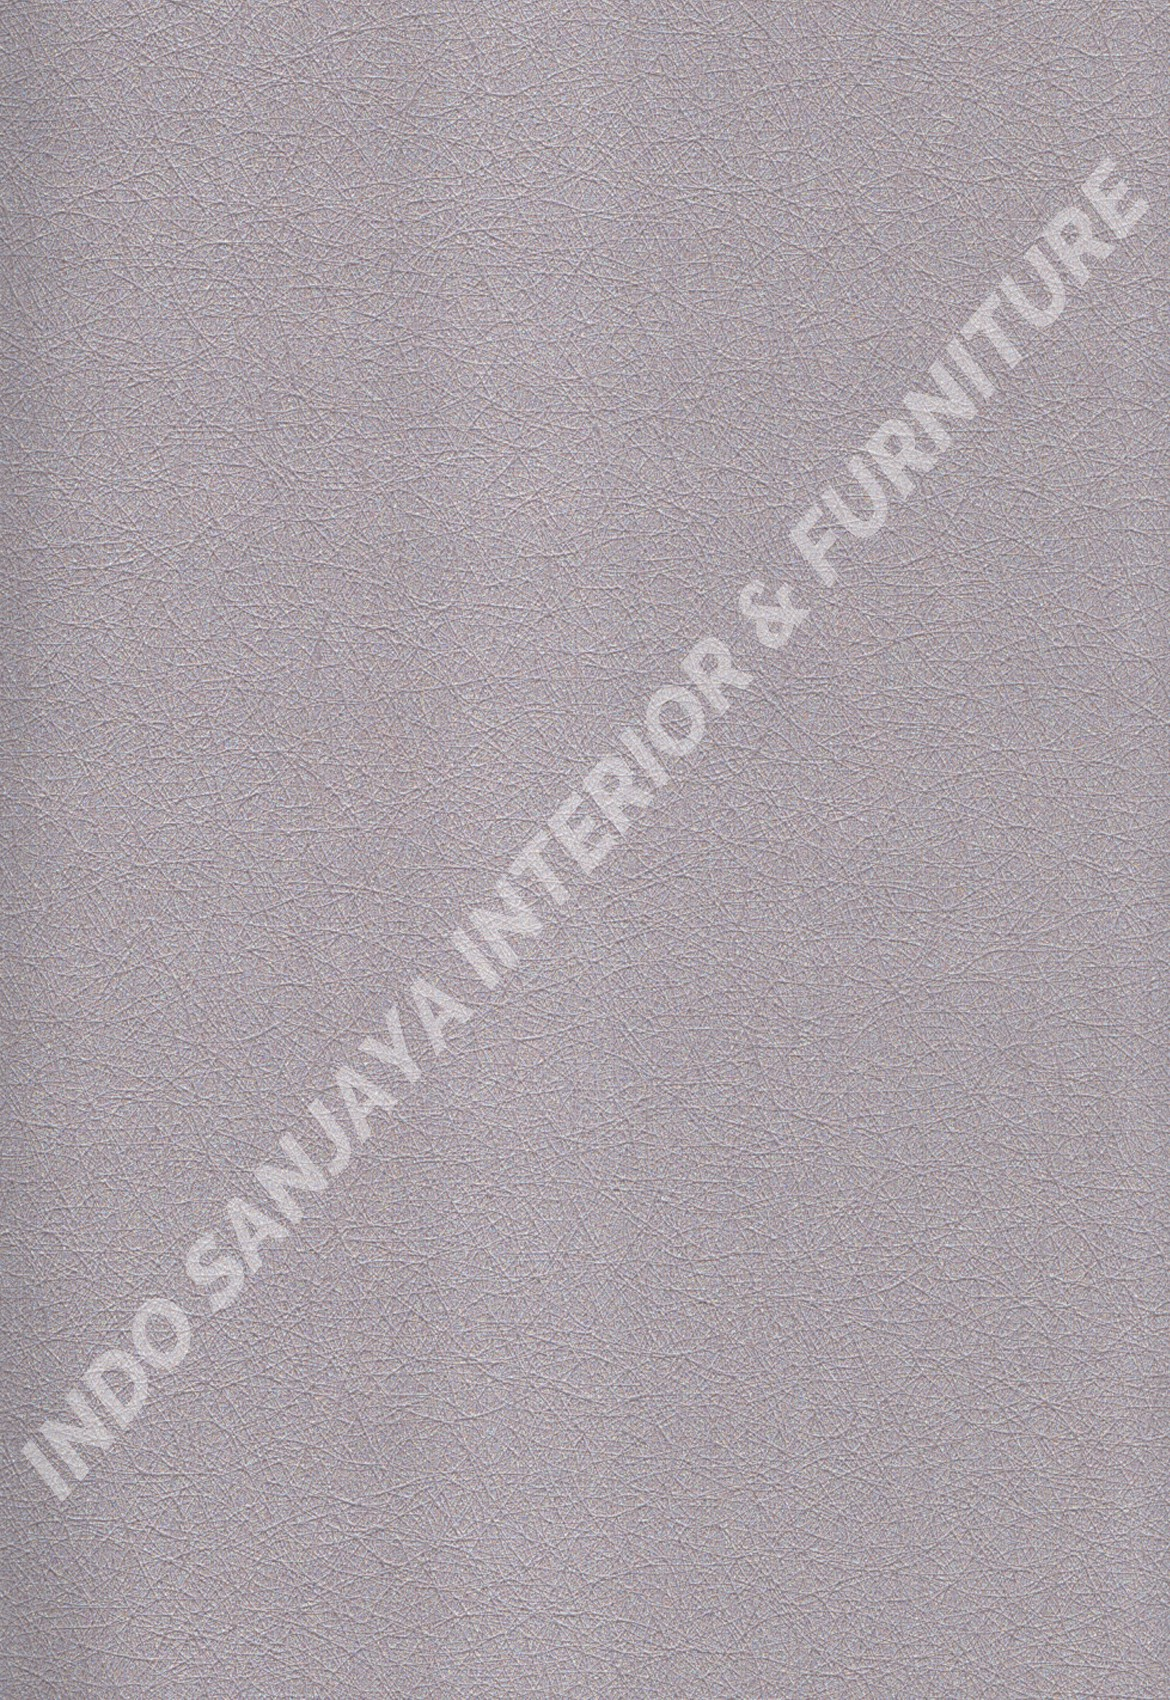 wallpaper   Wallpaper Minimalis Polos 83129-5:83129-5 corak  warna